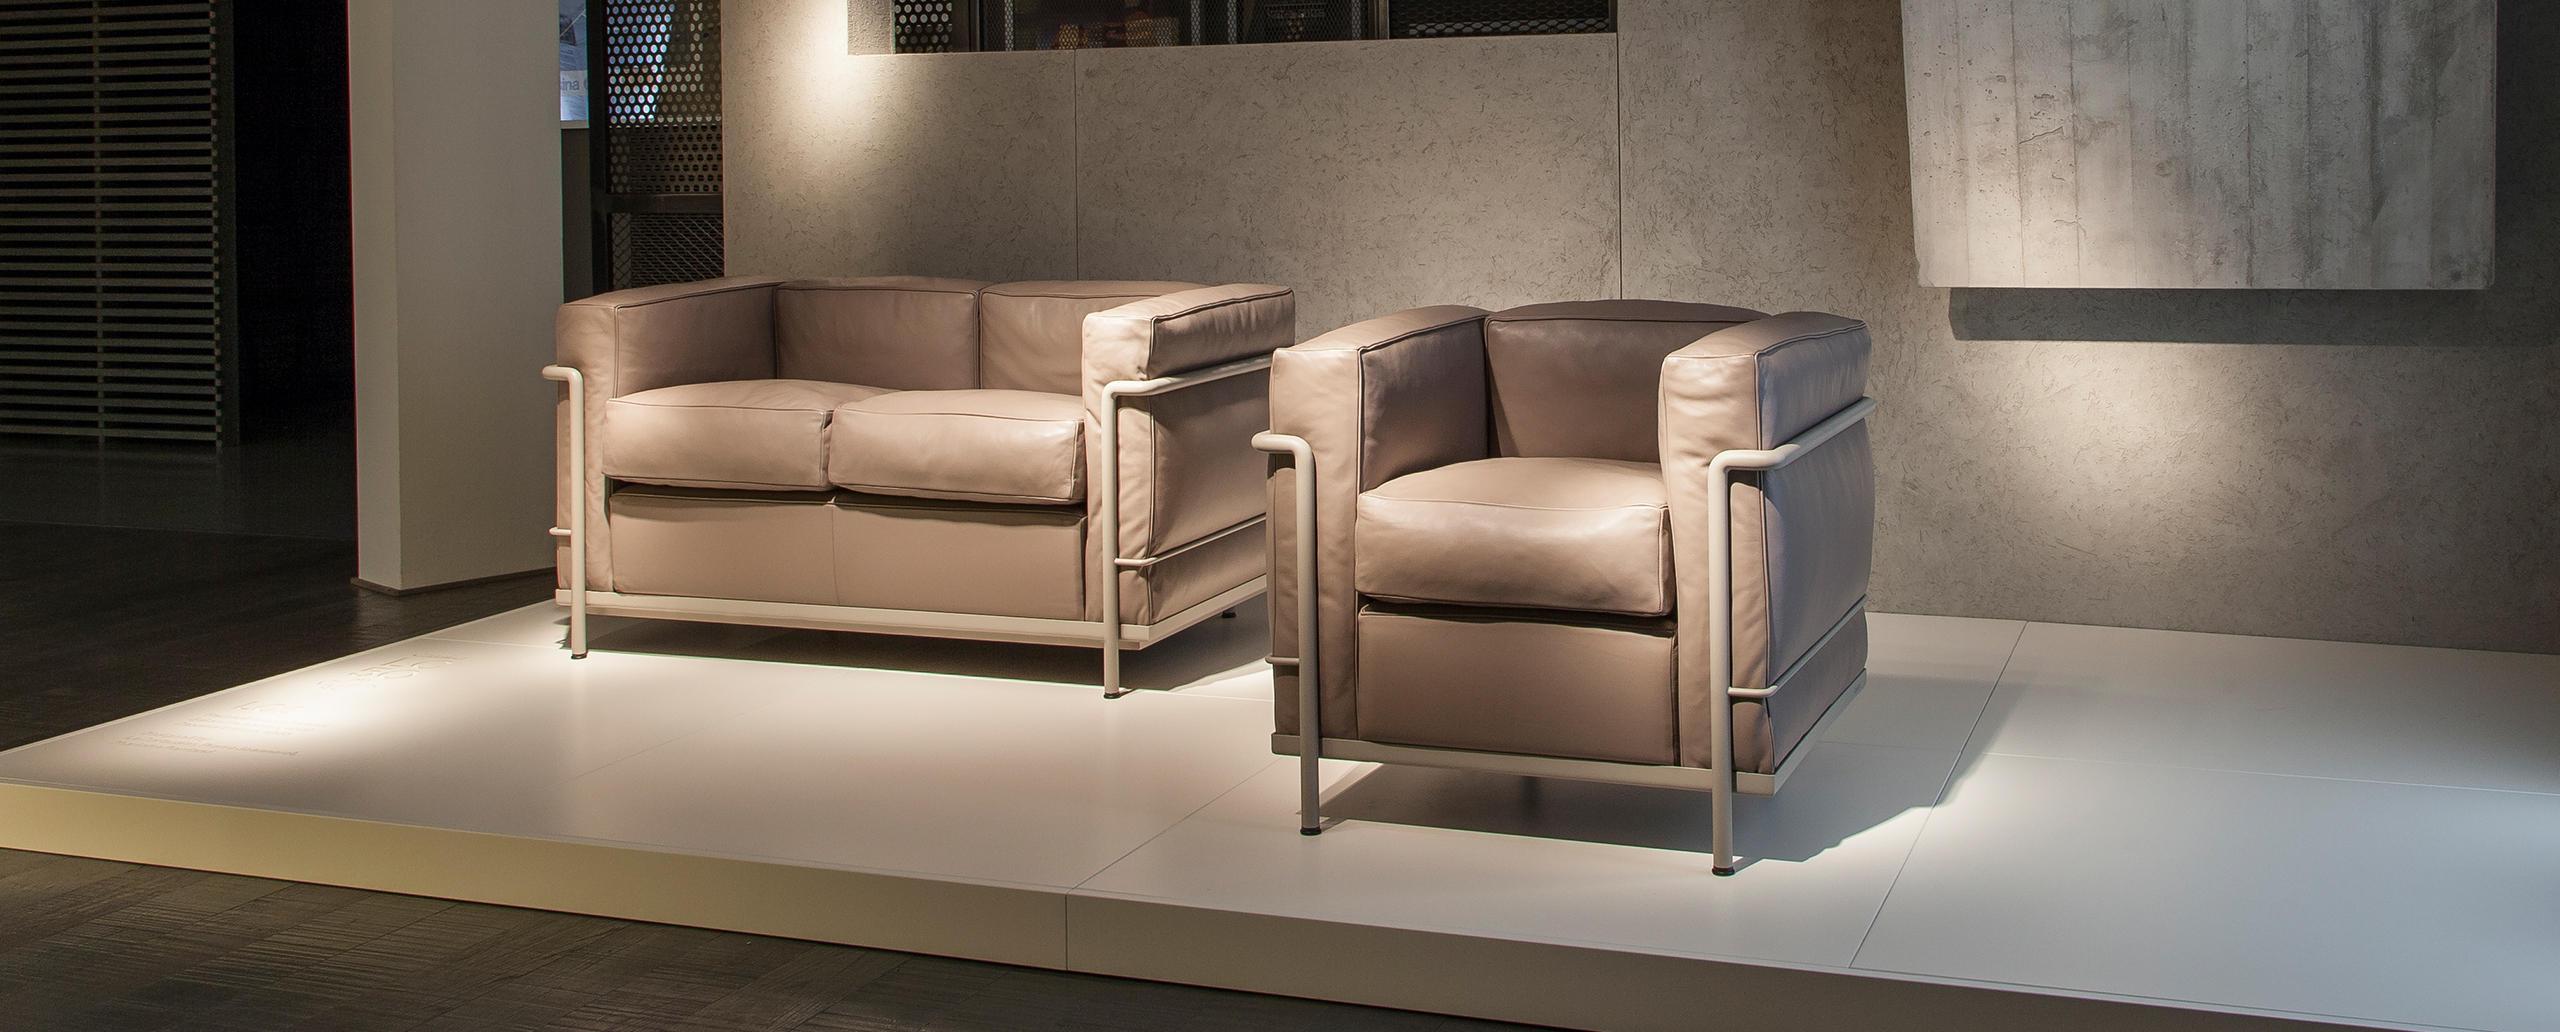 lc2 cassina le corbusier. Black Bedroom Furniture Sets. Home Design Ideas